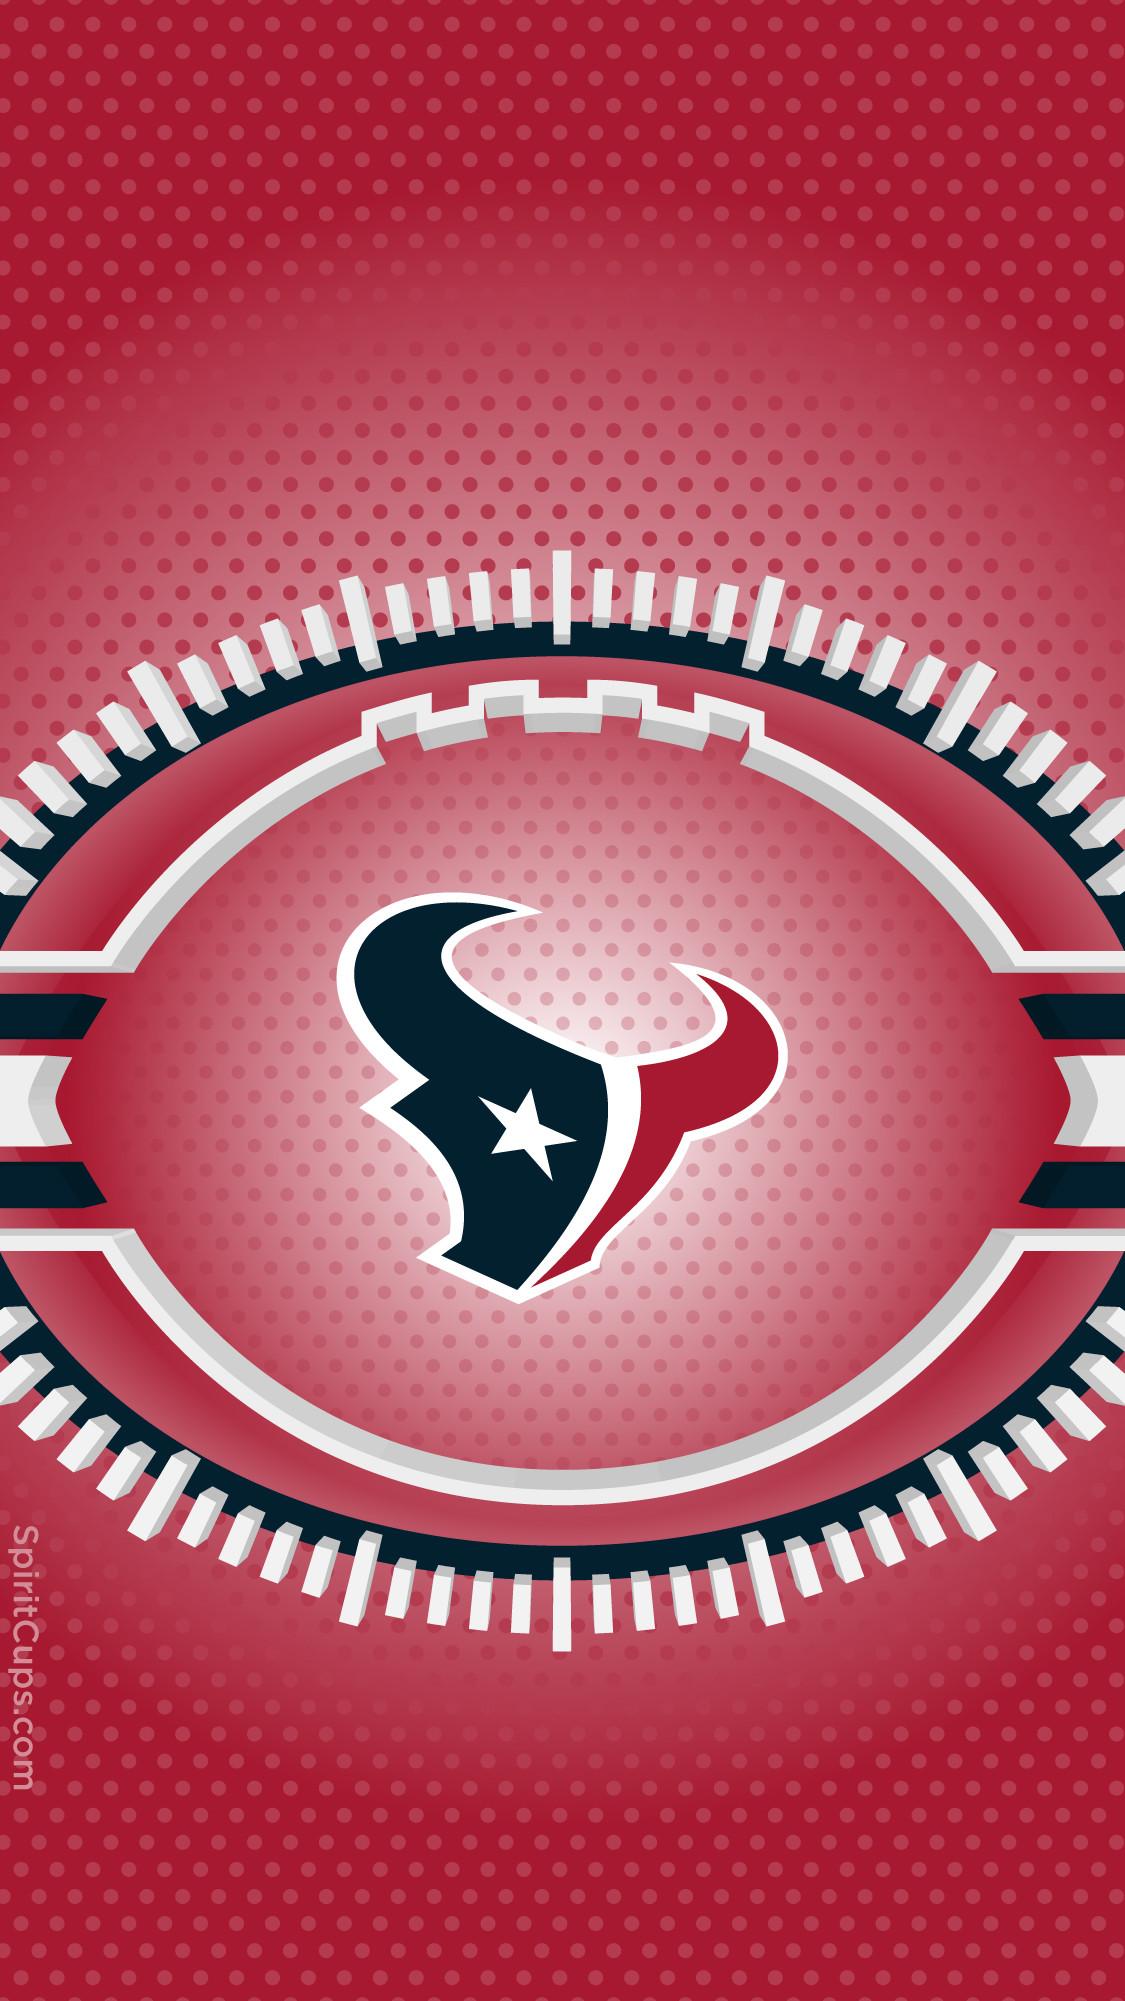 Houston Texans Iphone Wallpaper 66 Images